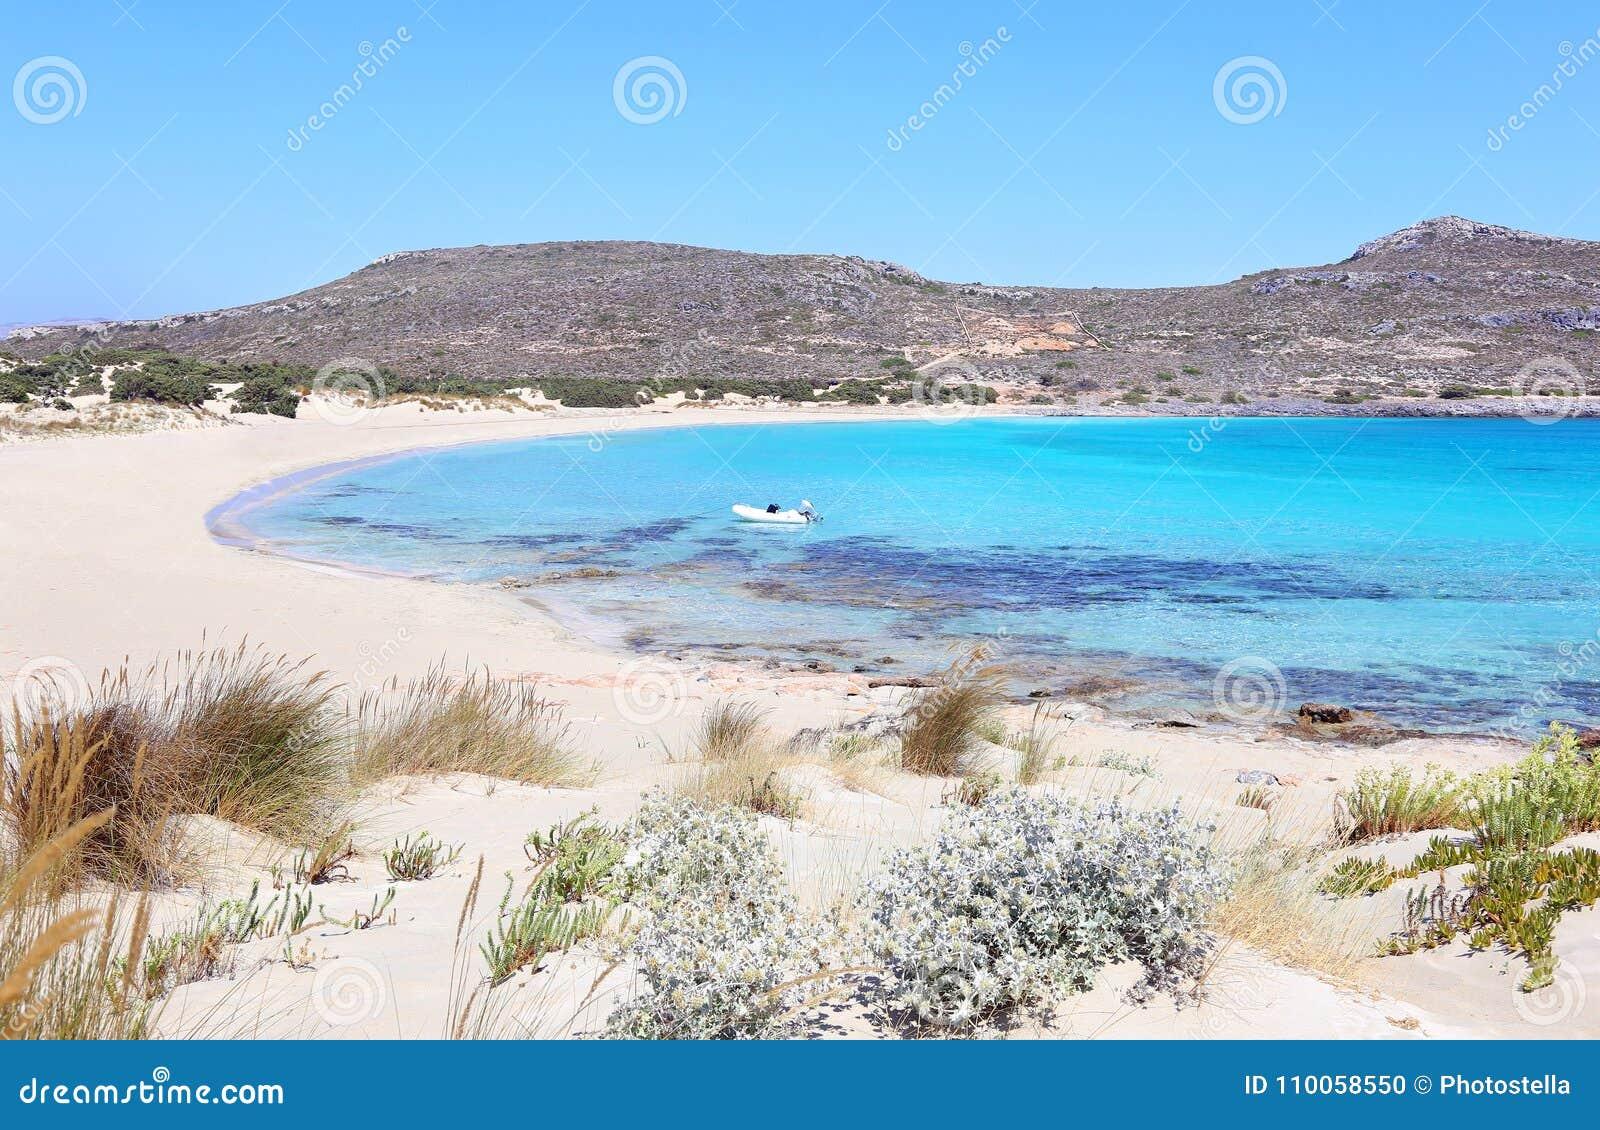 Landscape of Elafonisos beach Peloponnese Greece